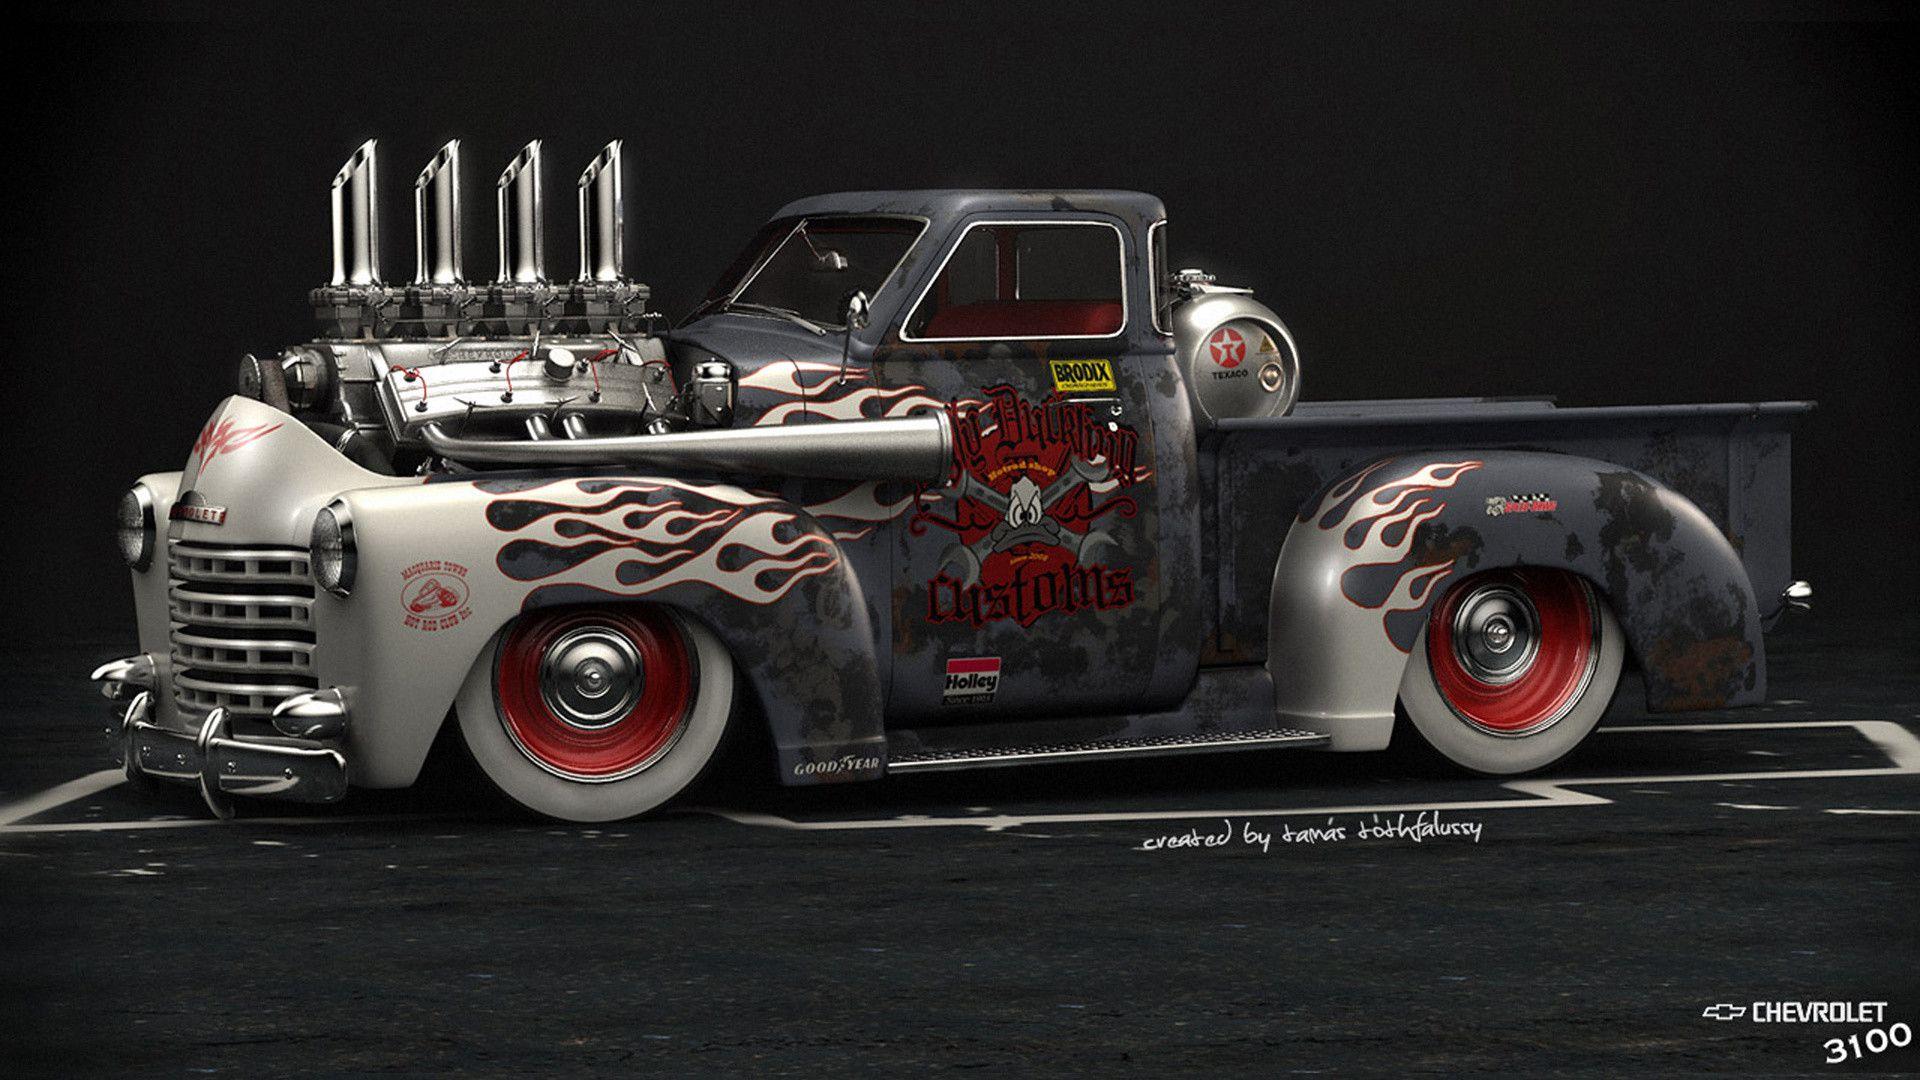 American Muscle Car Wallpaper 1920x1080 For Mac Retro Cars Hot Rod Pickup Car